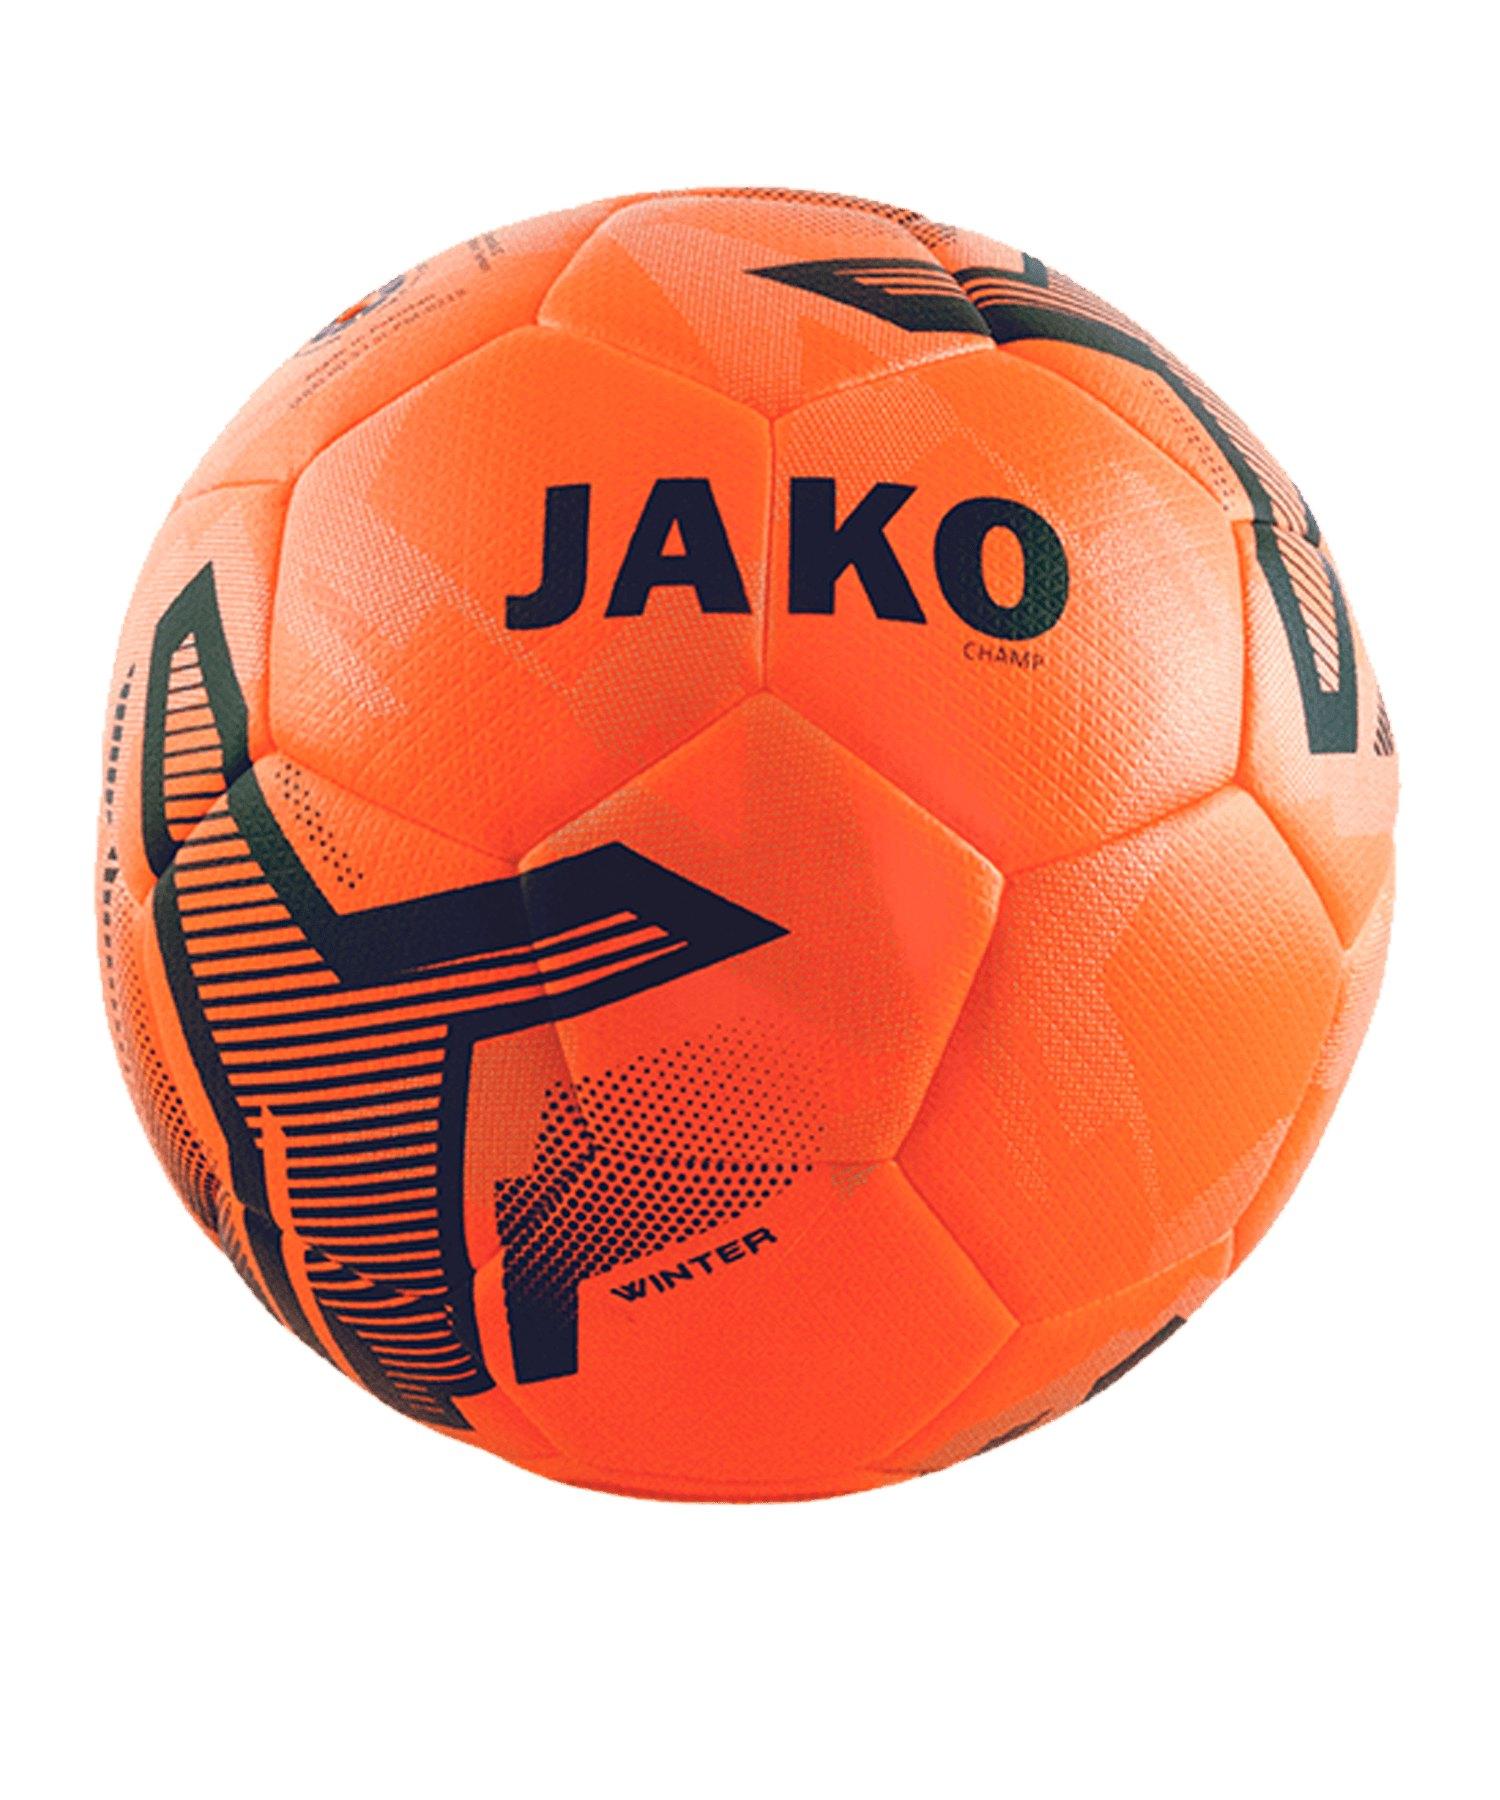 JAKO Ball Champ Winter Spielball Orange F19 - orange